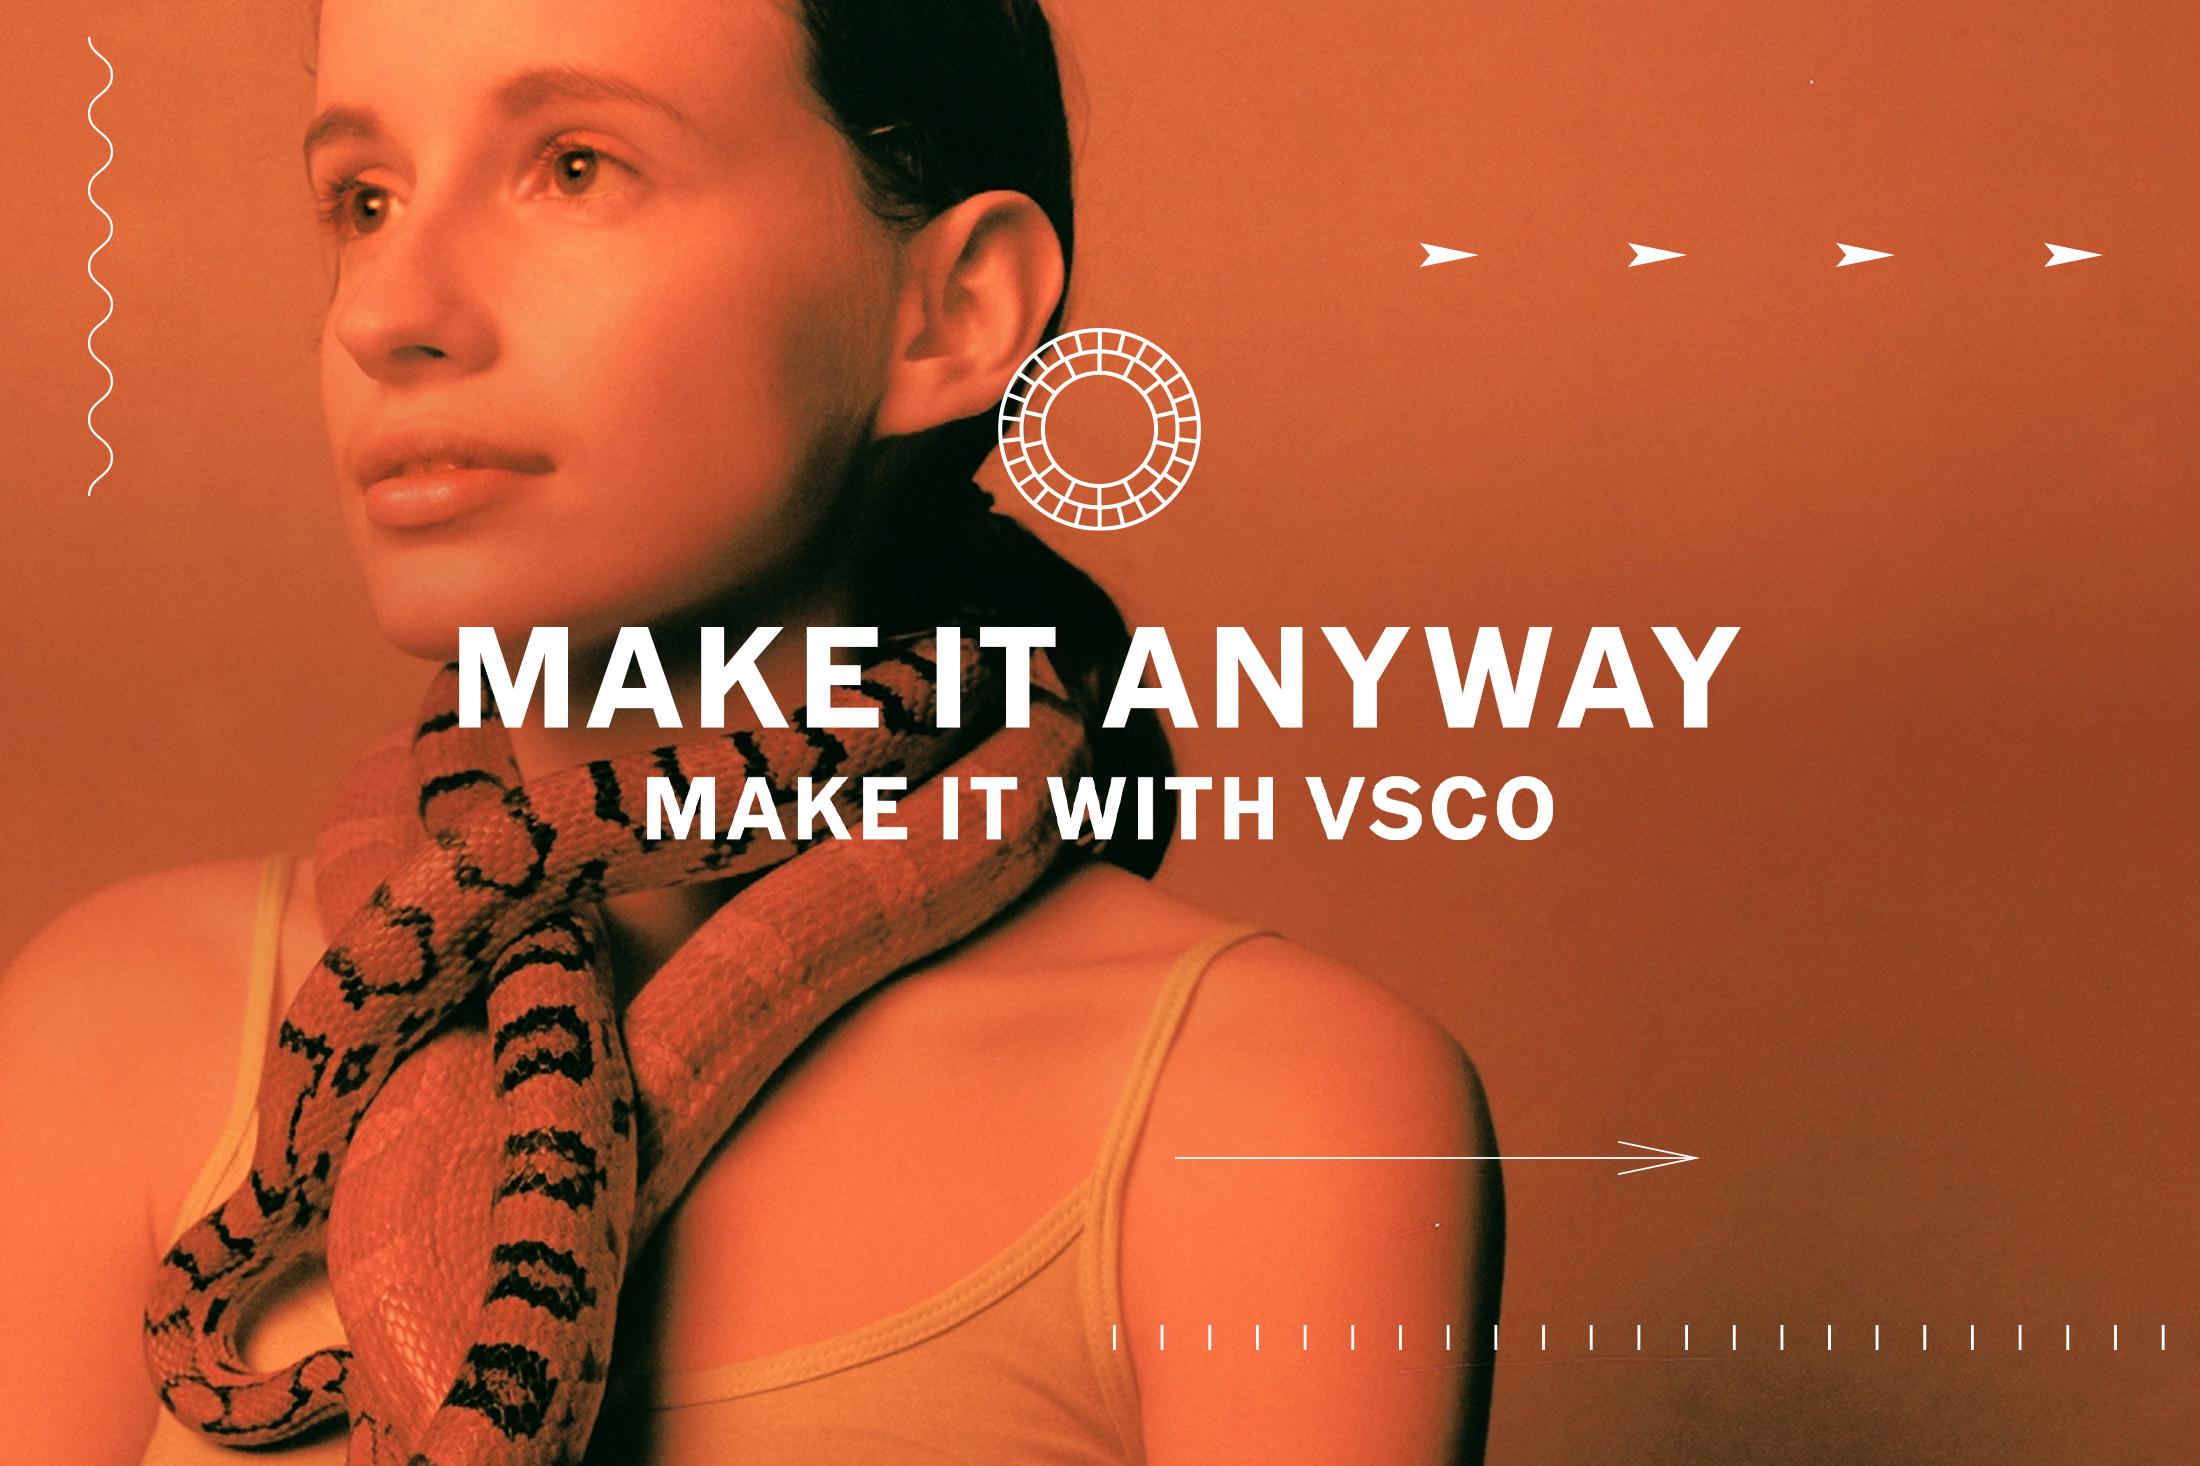 Make It Anyway   May 31, 2019 — A celebration of the process. What's holding you back? Make it anyway. Make it with VSCO. #VSCO